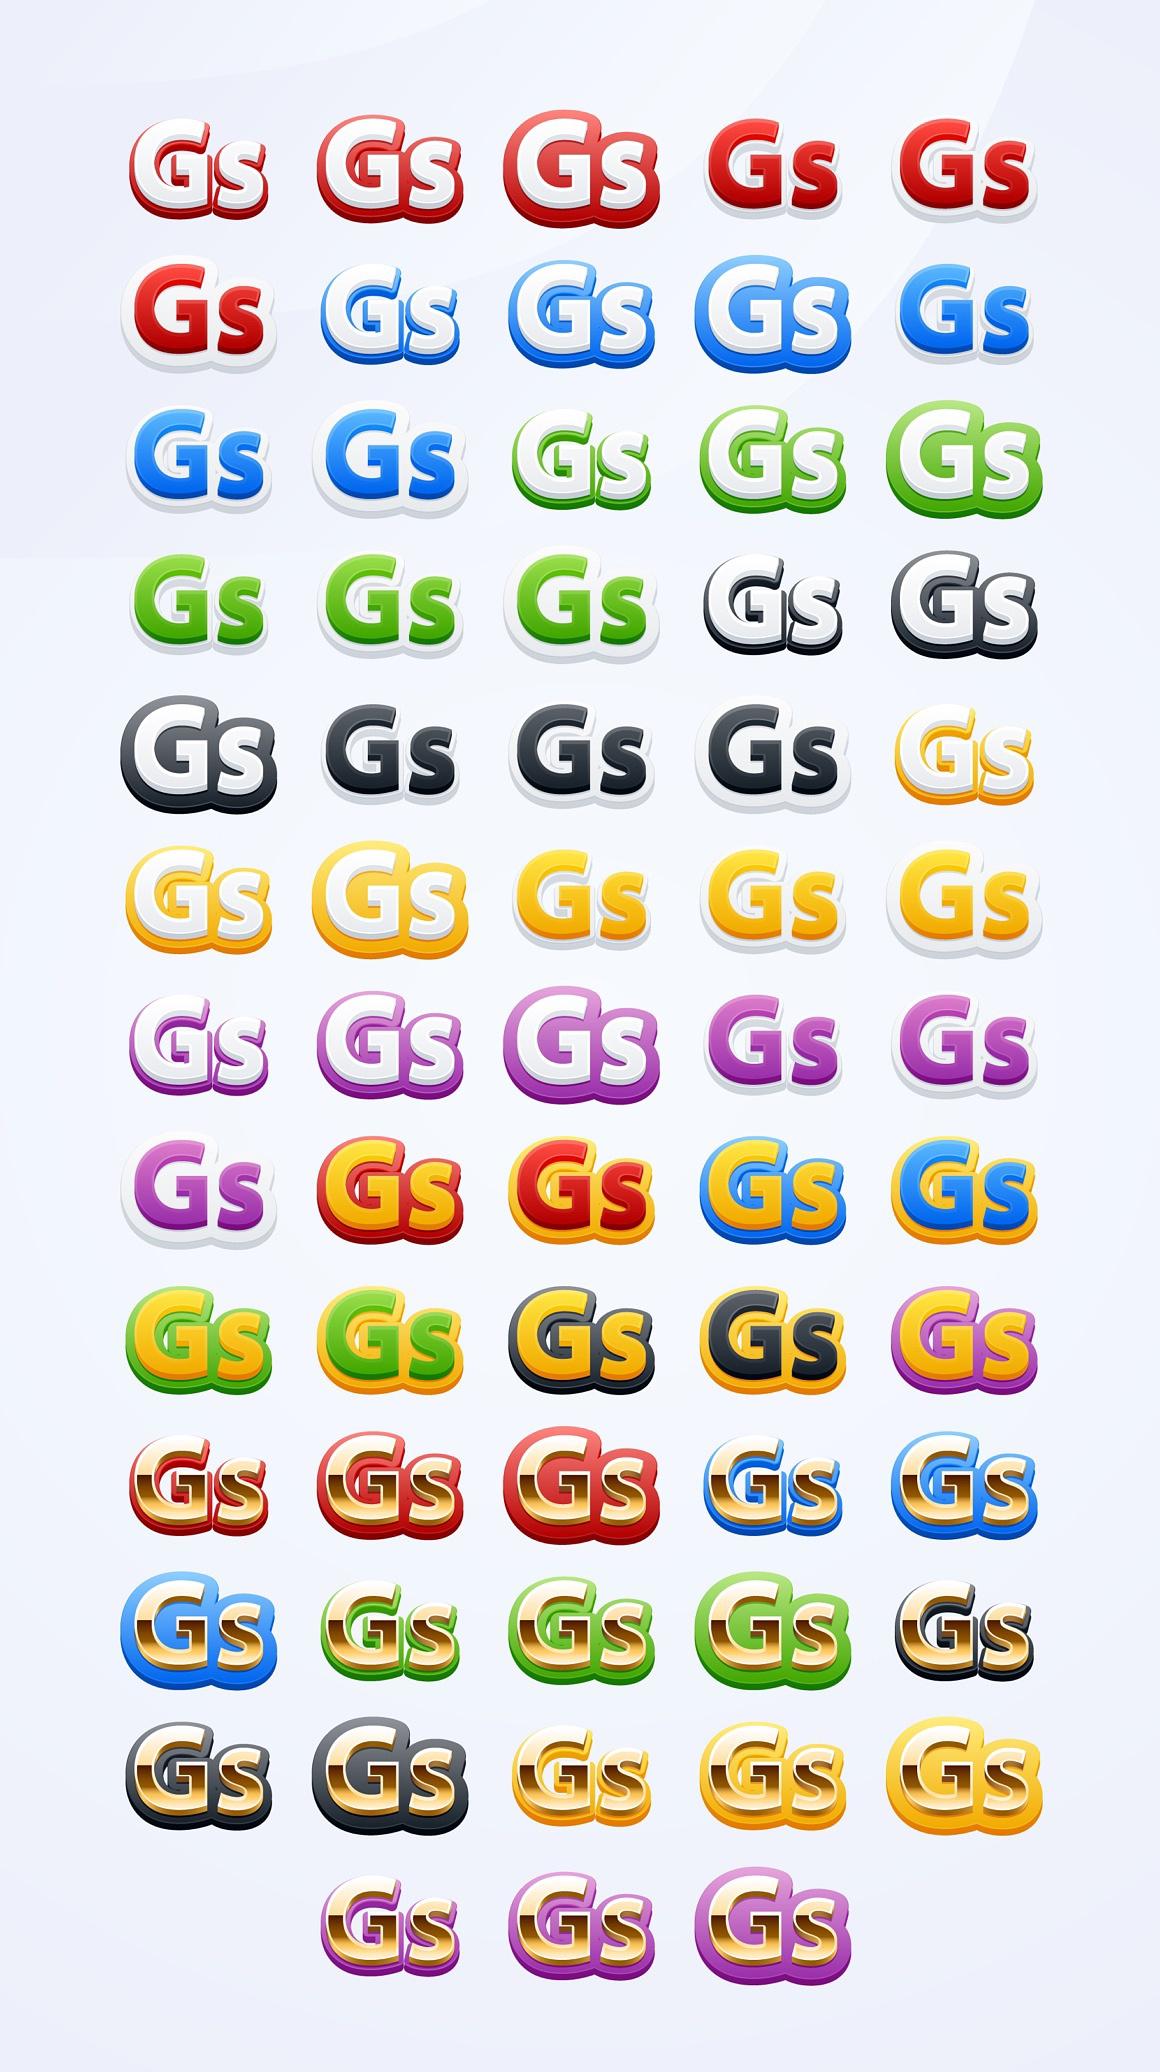 Funny Adobe Illustrator Styles images/funny_2_styles.jpg